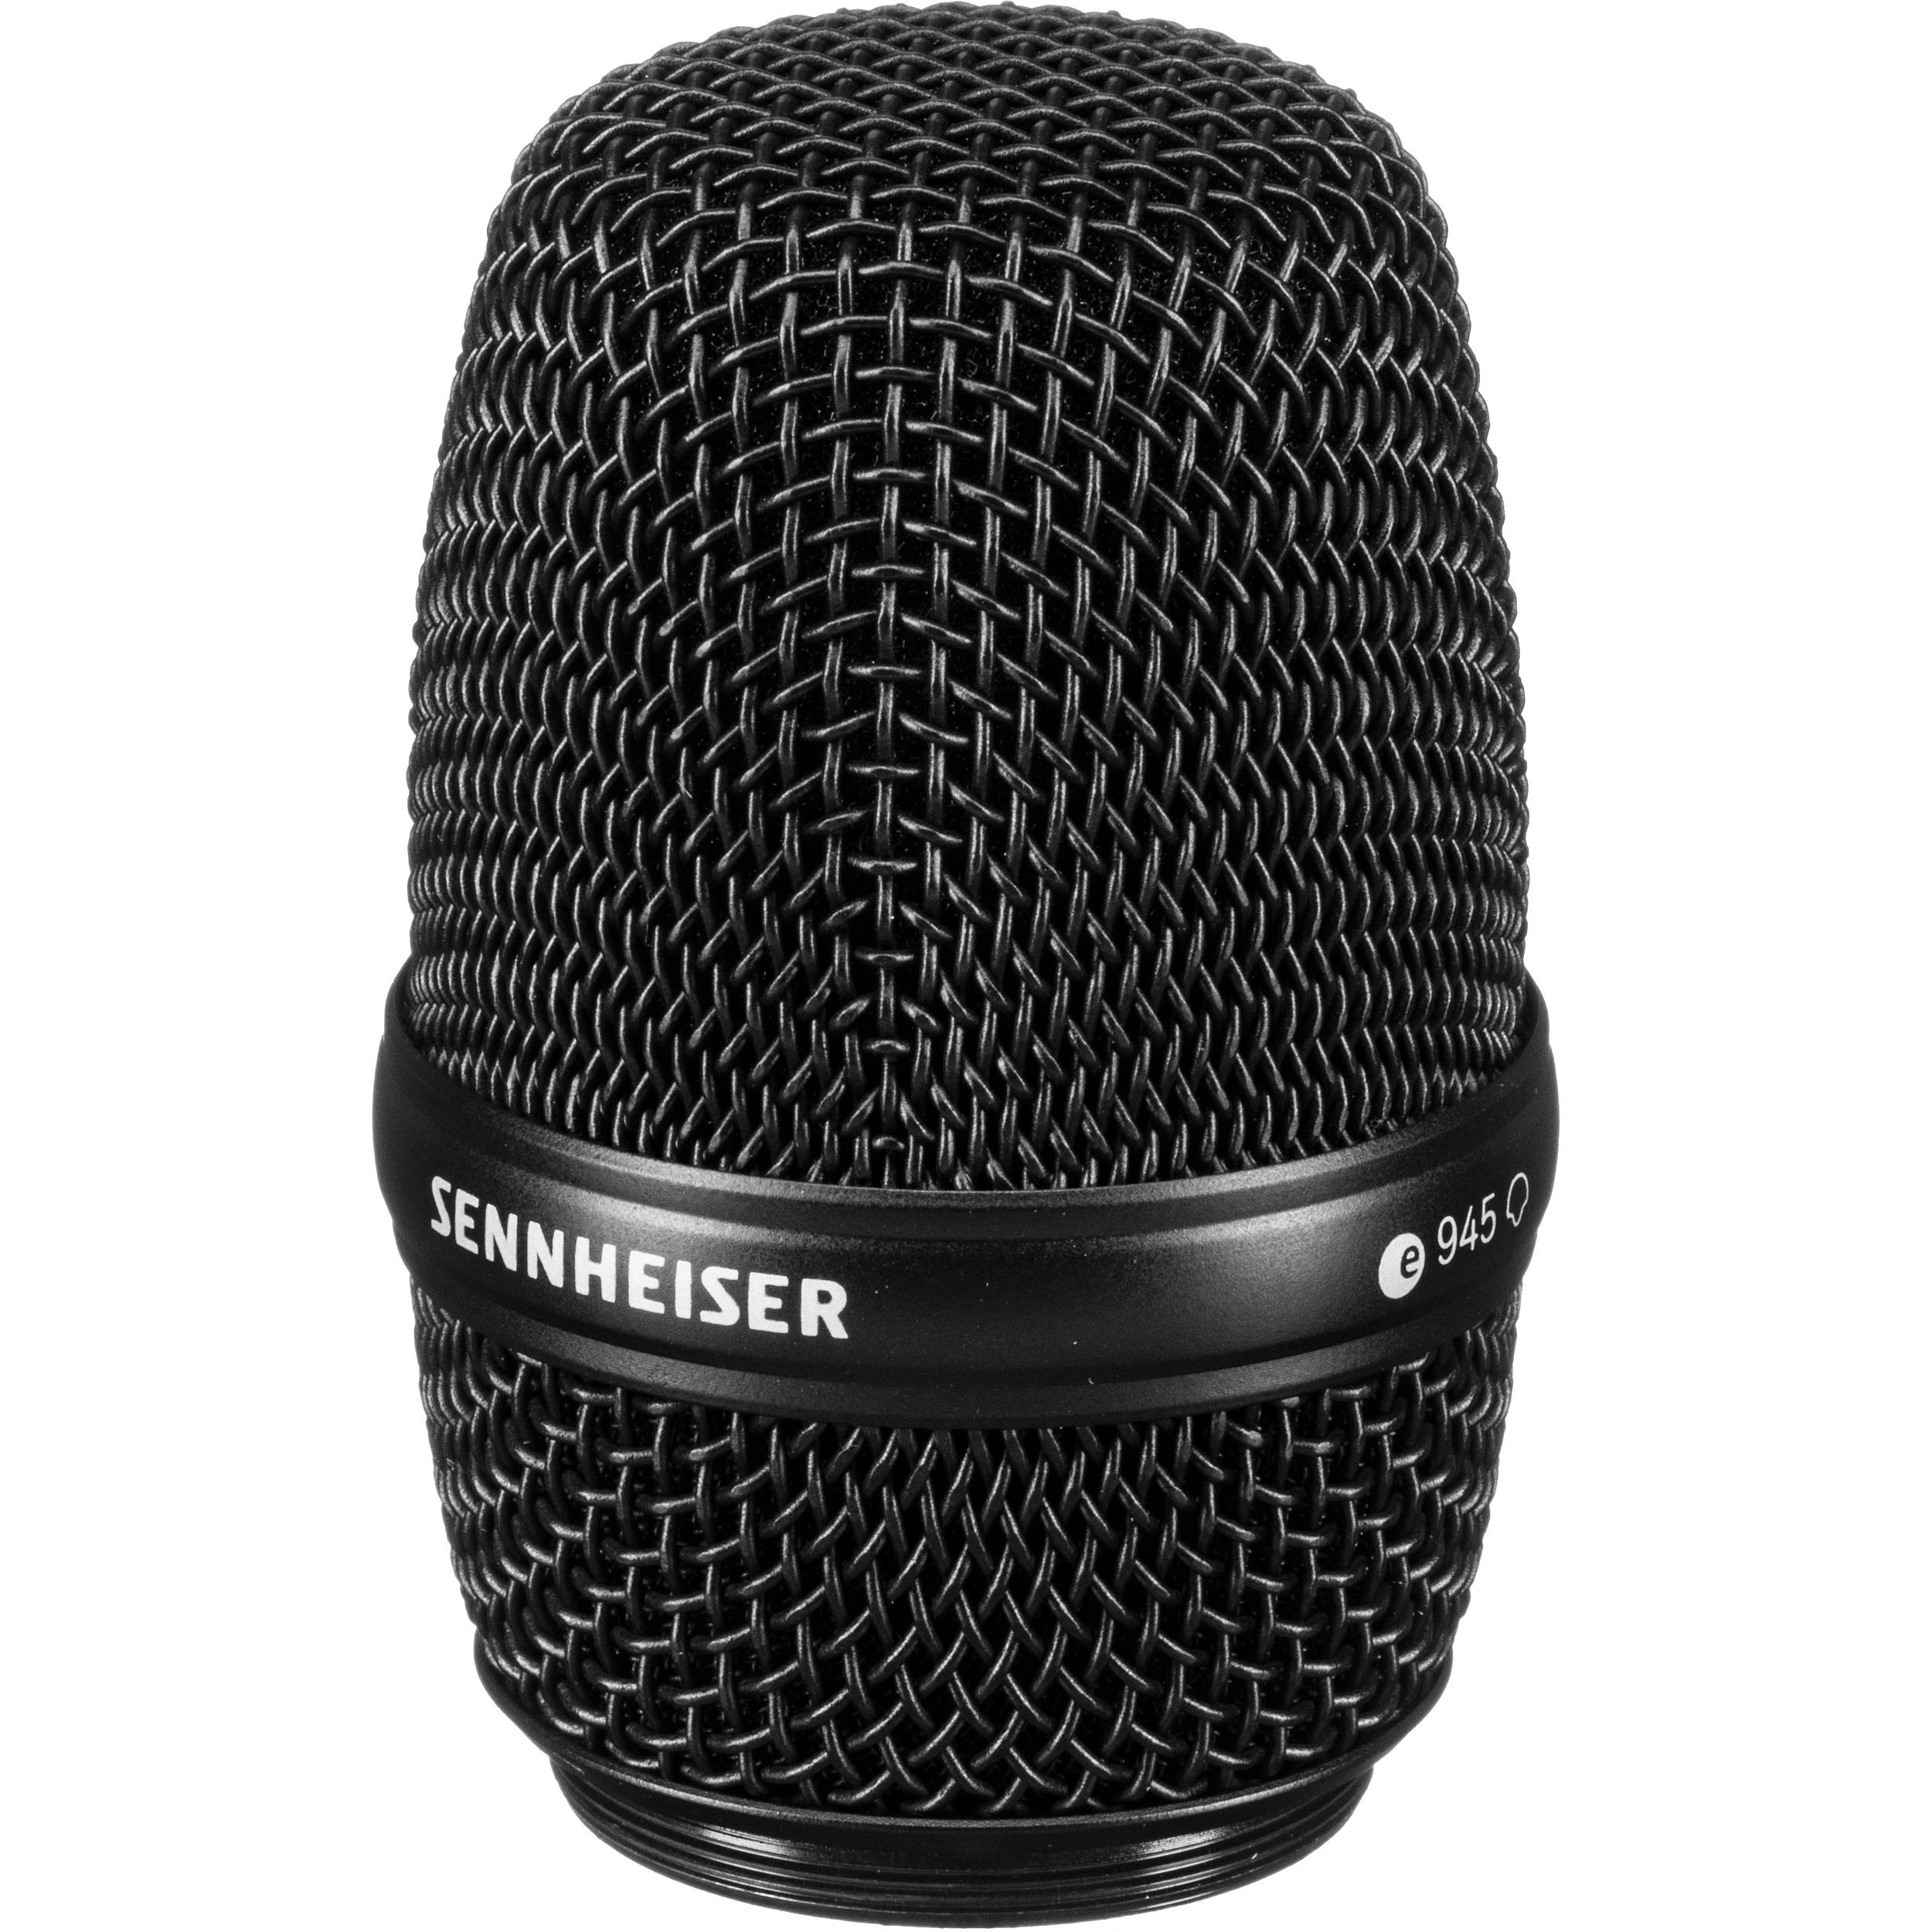 Sennheiser MMD 945B Supercardioid Dynamic Capsule for Handheld Transmitters  (Black)